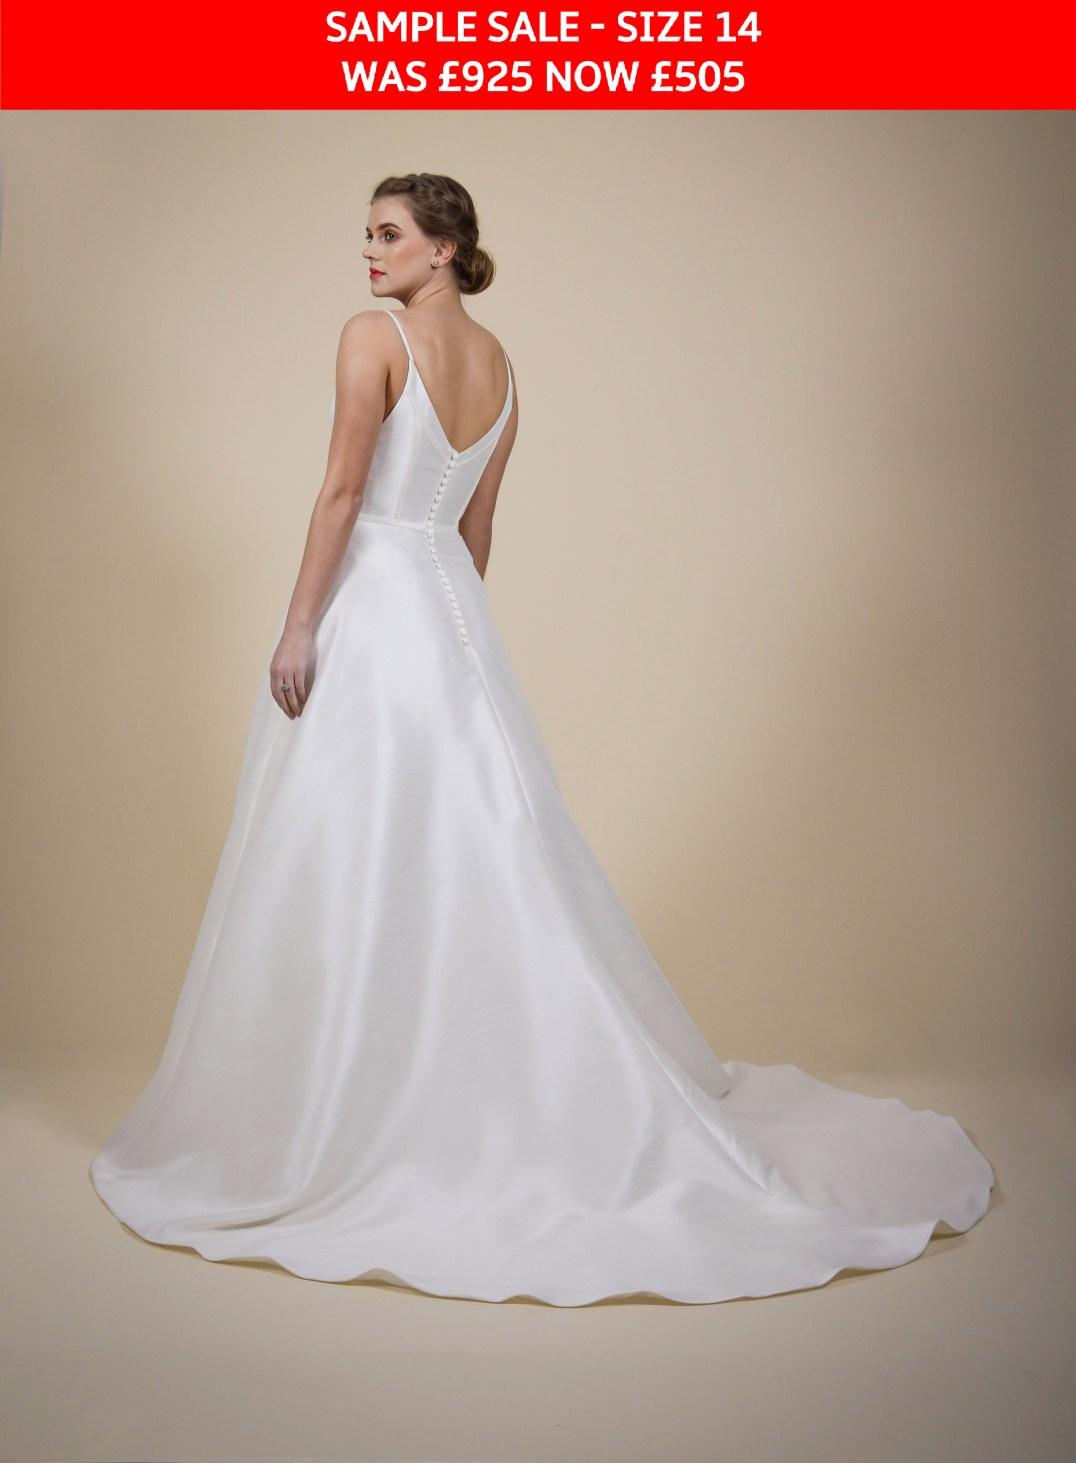 GAIA Tania wedding gown sample sale